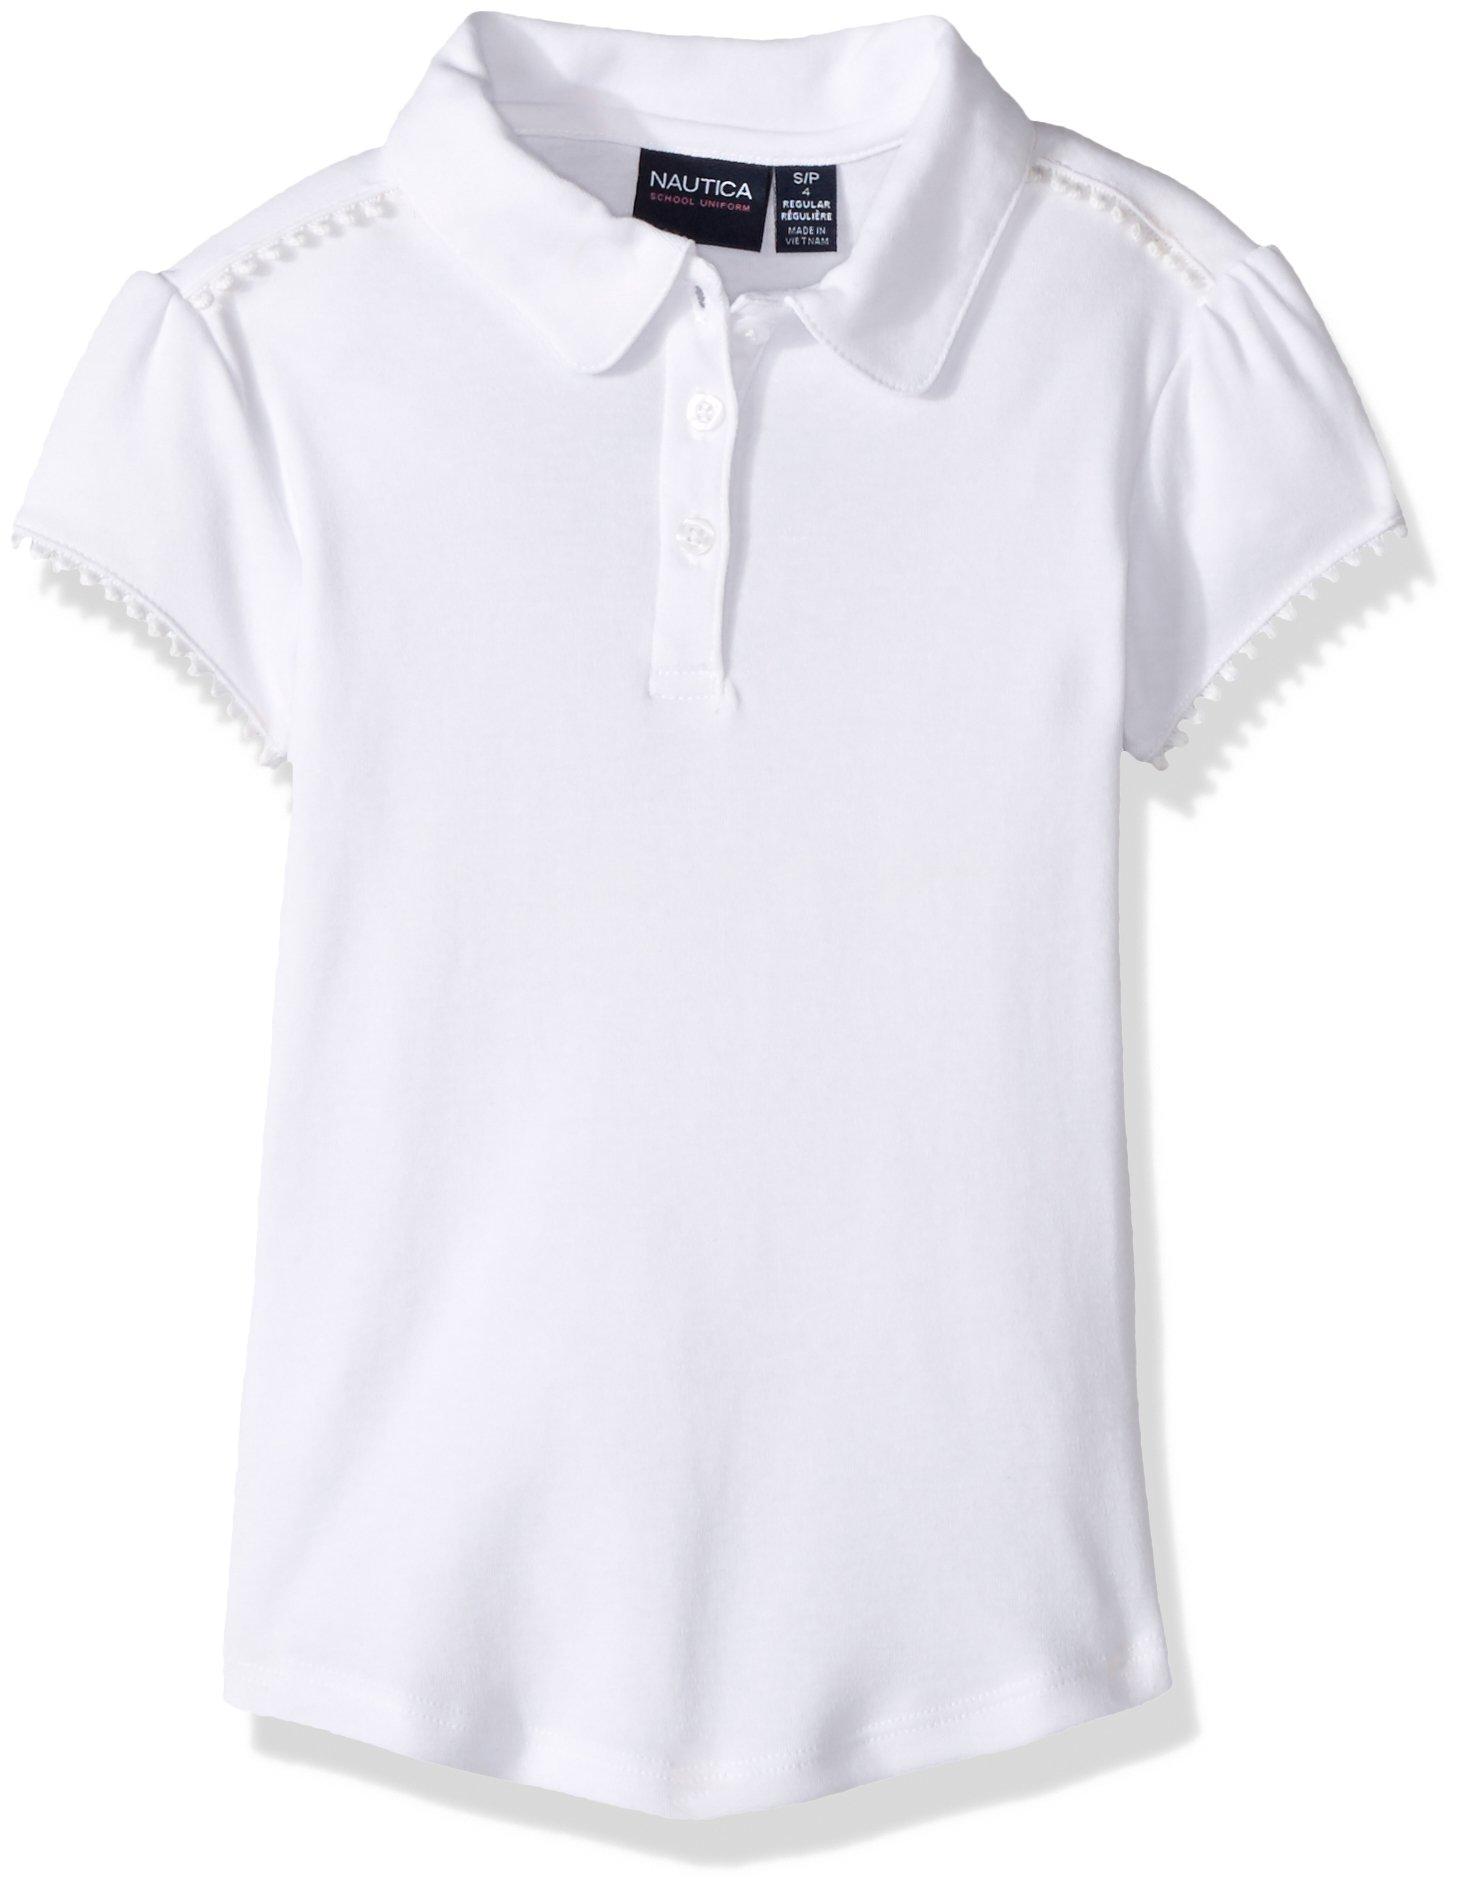 Nautica Girls' Short Sleeve Polo, White/Ruffle Placket, L (6)